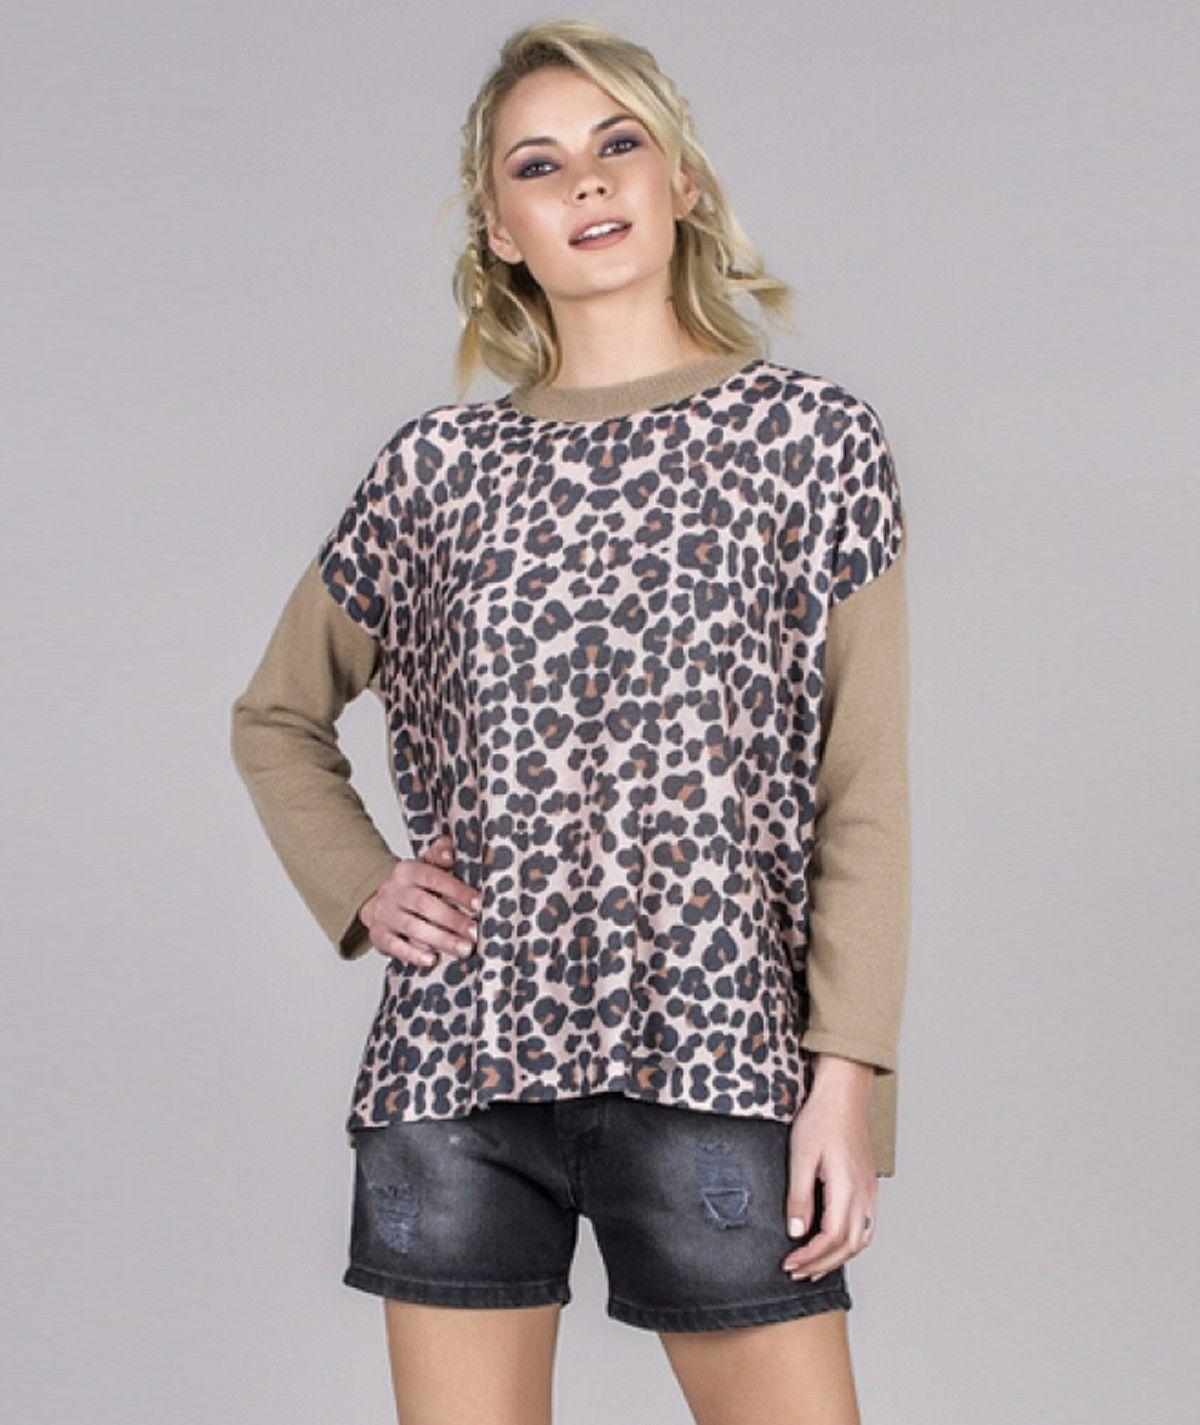 Camisola motivo leopardo